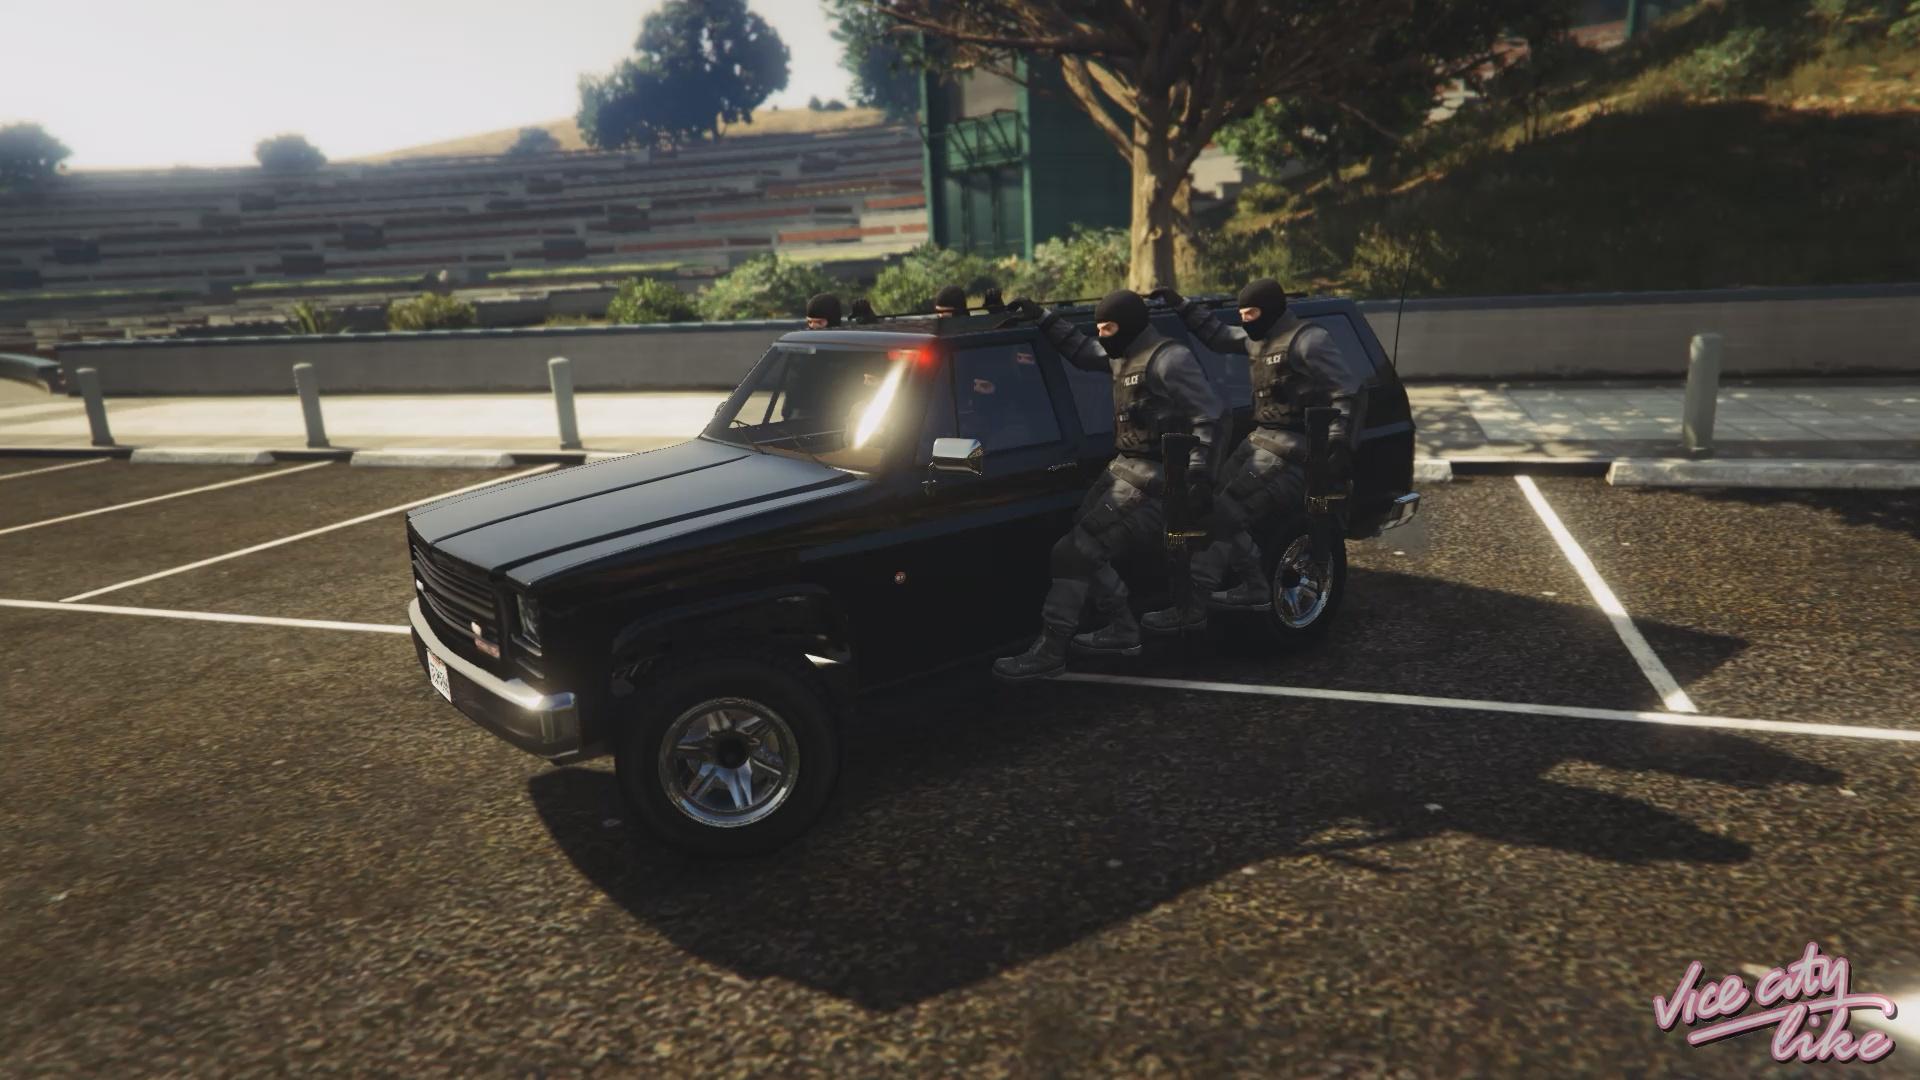 F.I.B. Rancher (Like Vice City) - GTA5-Mods.com